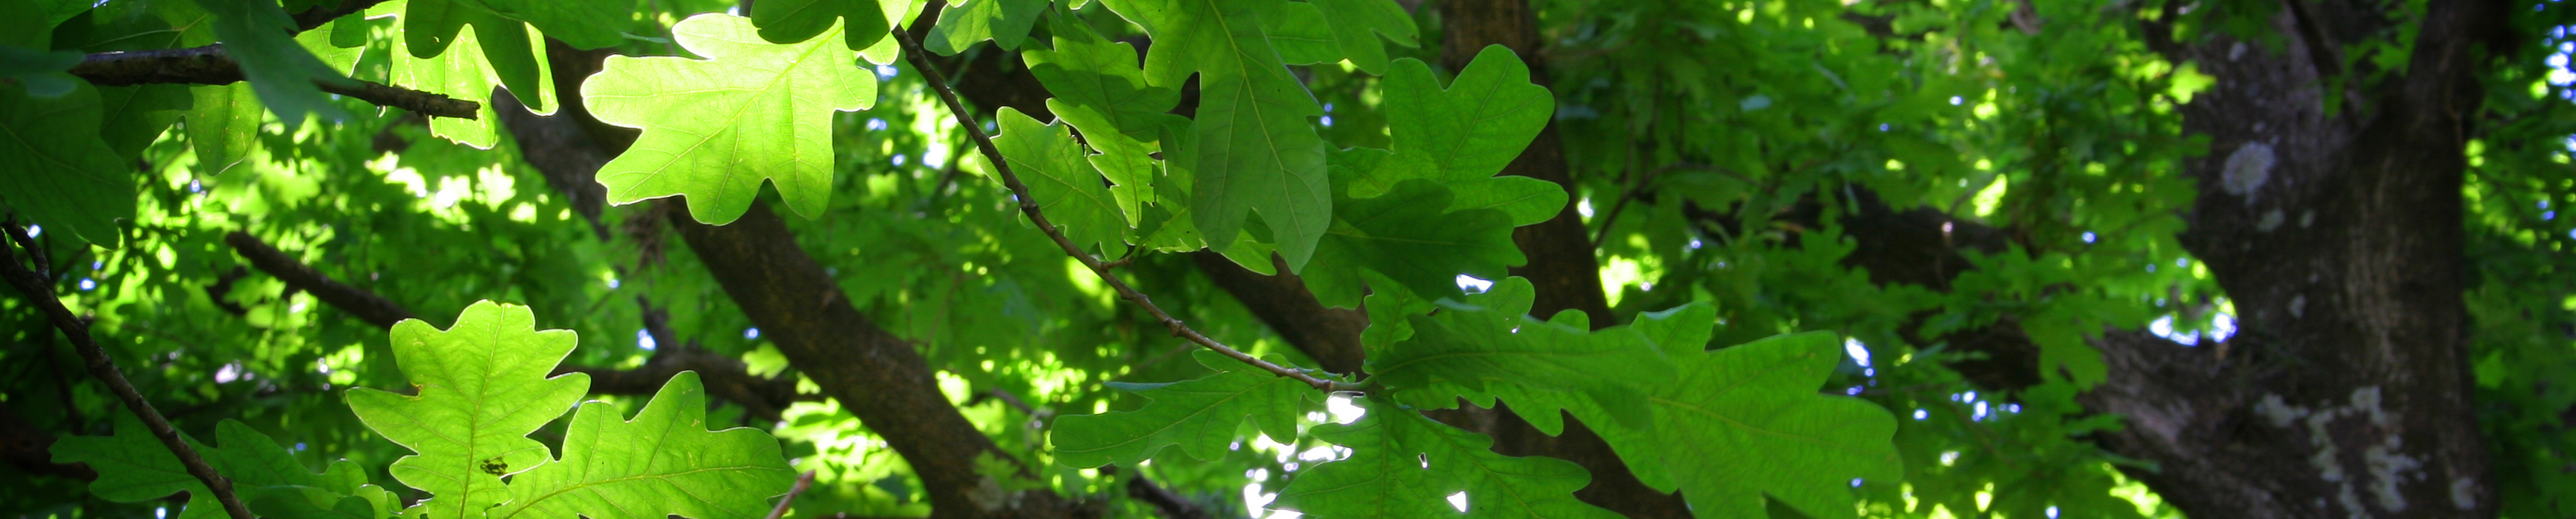 treecanopy-croped1